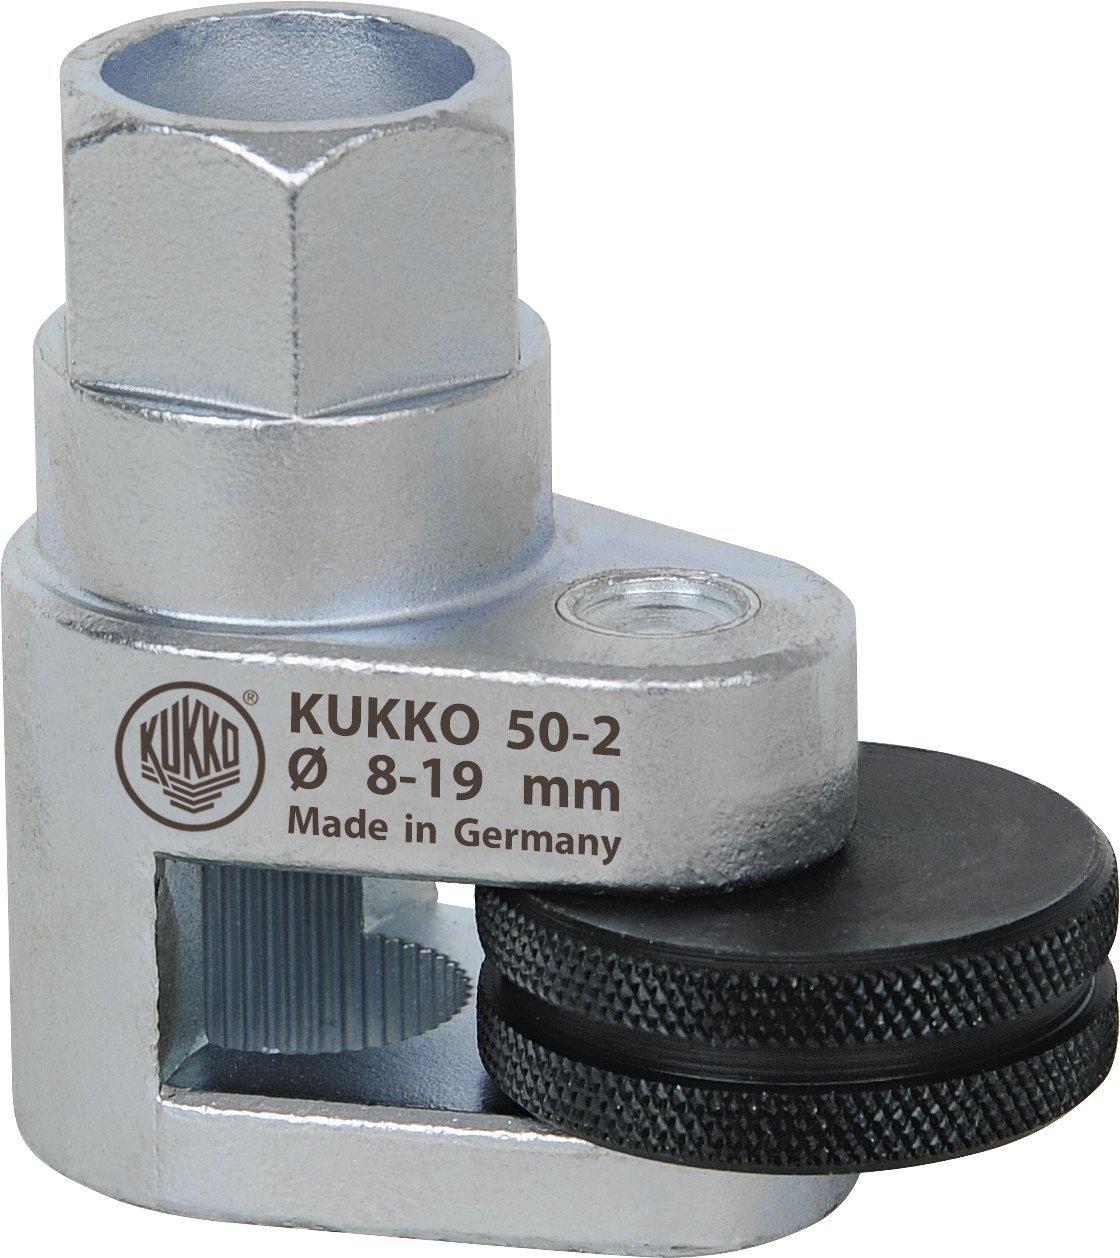 Kukko 51-1 Stehbolzen Ausdreher /Ø 5-10 mm